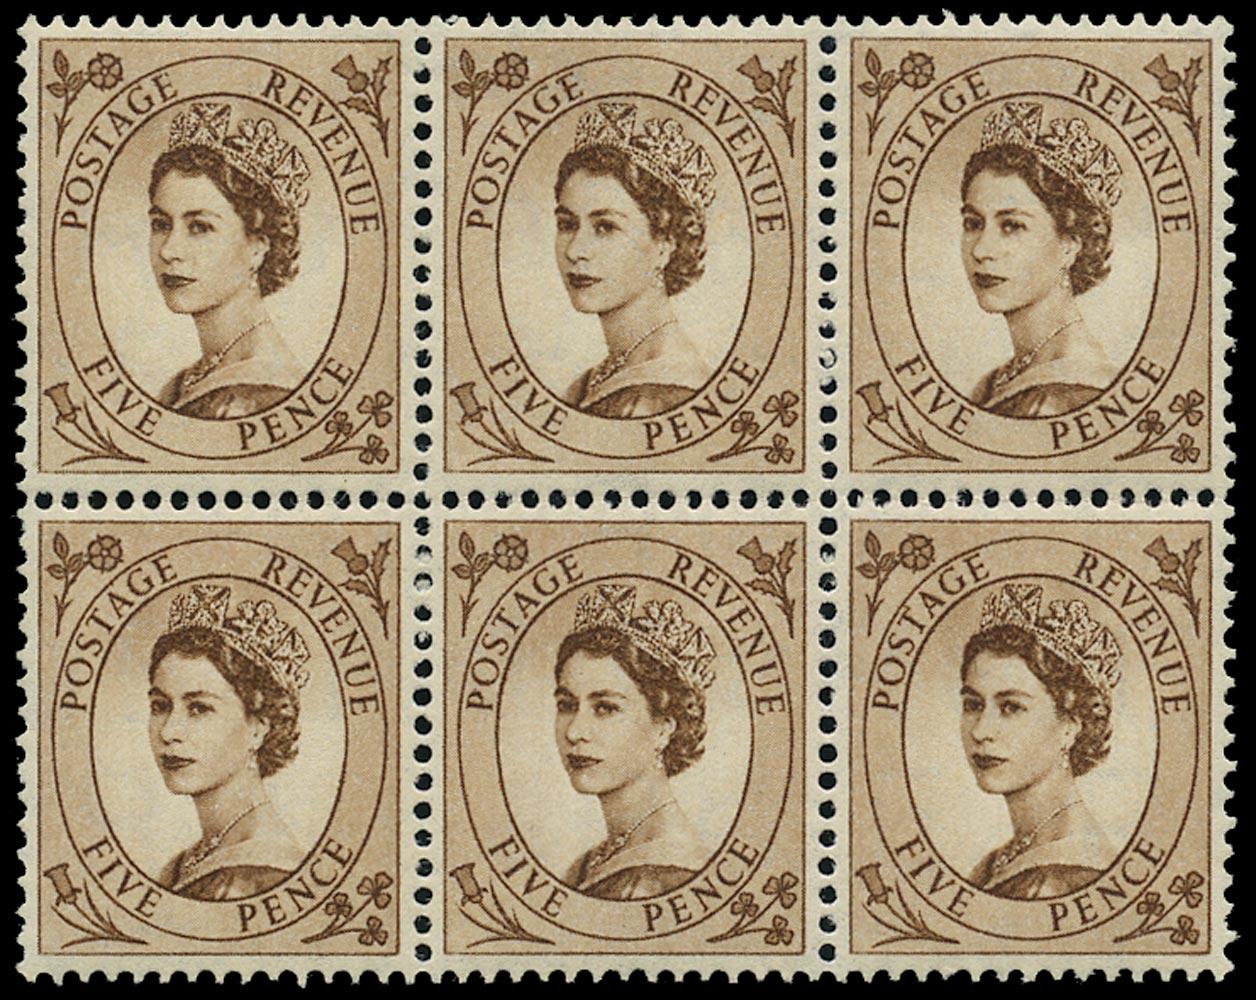 GB 1953  SG522var Mint - 'Spot on E of POSTAGE' variety